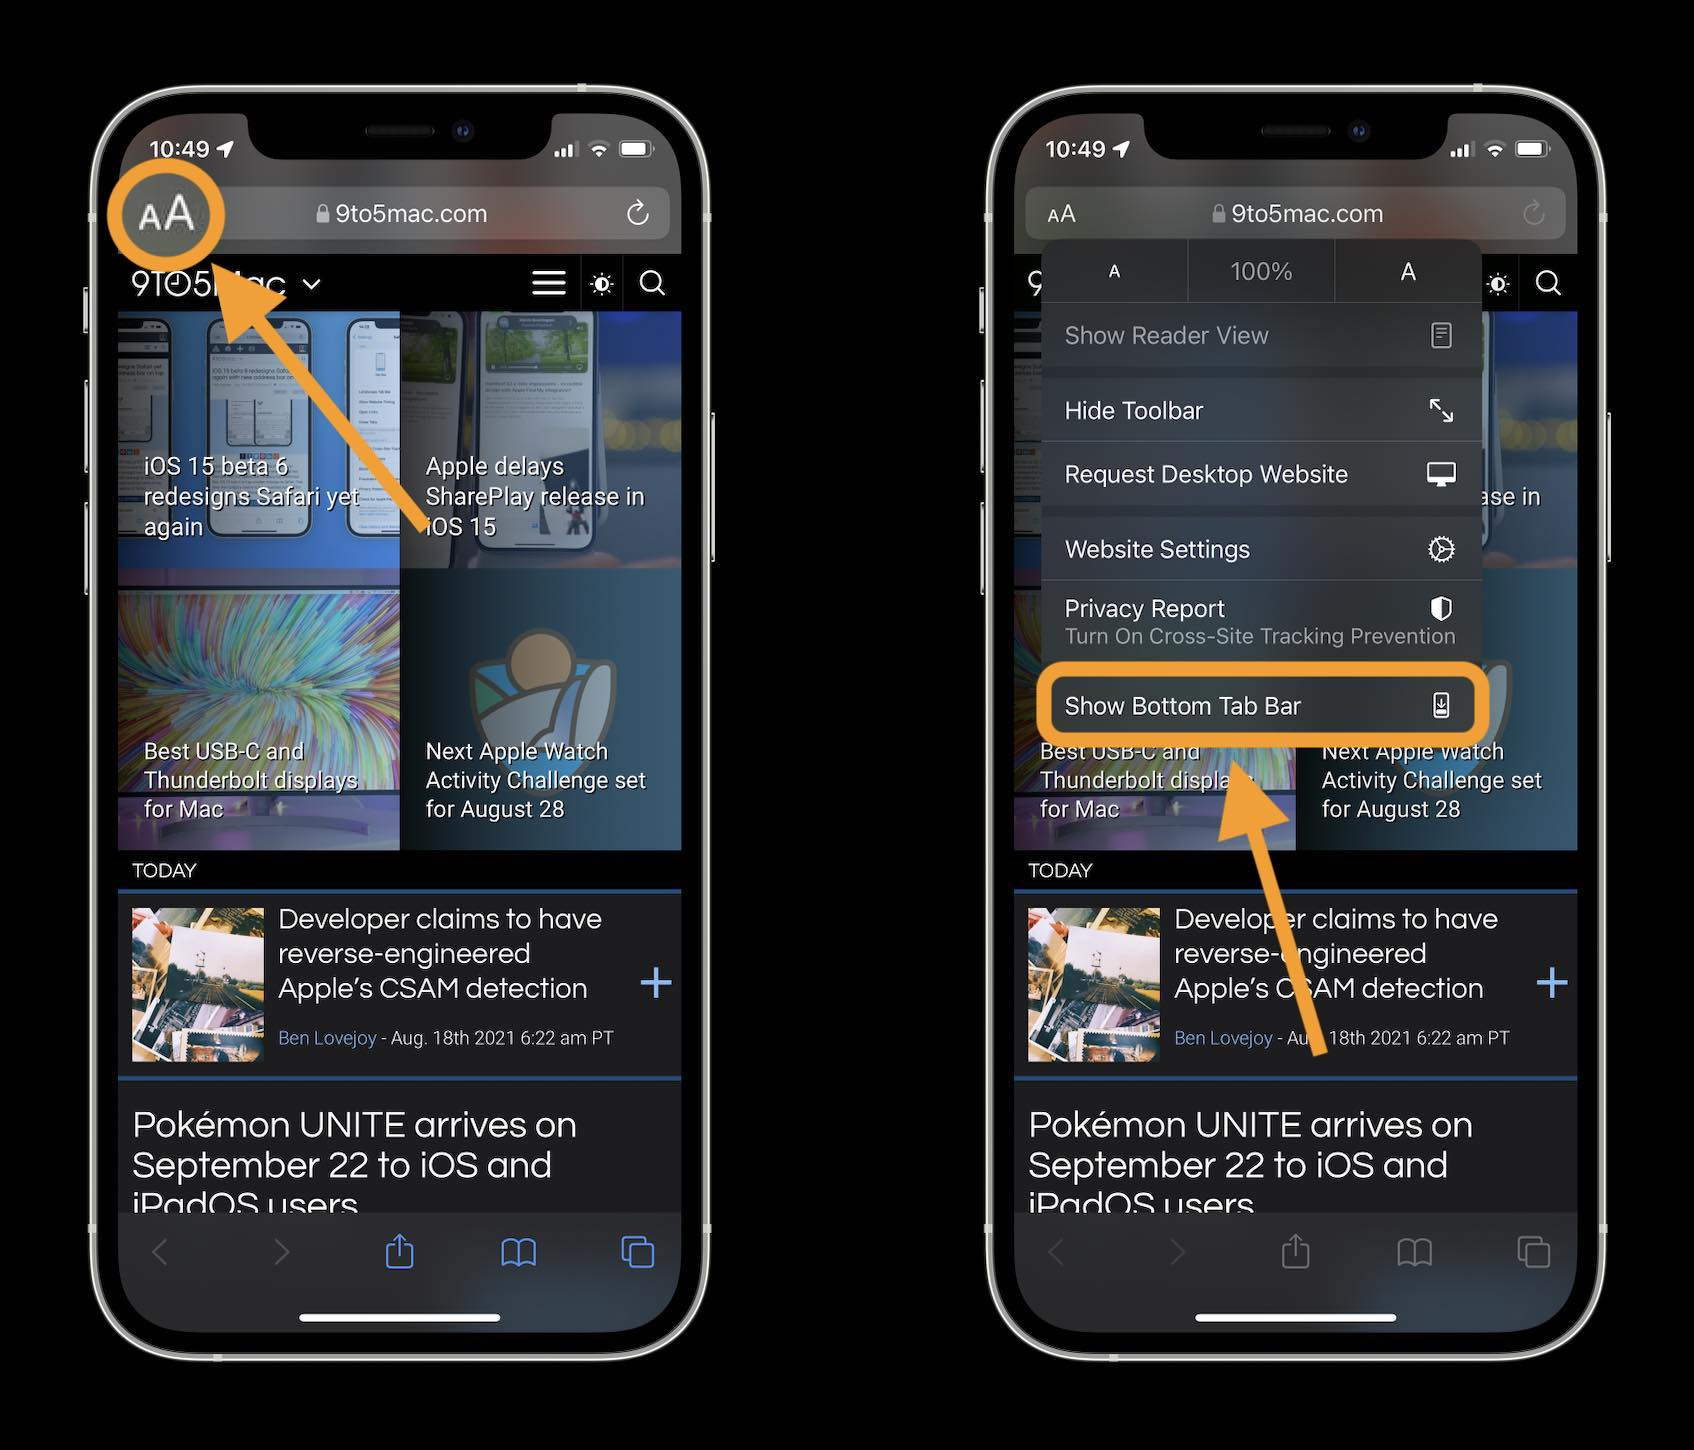 How to change iOS 15 Safari address/search bar on iPhone walkthrough 2- tap aA icon in top left corner in the address/search bar and tap Show Bottom Tab Bar